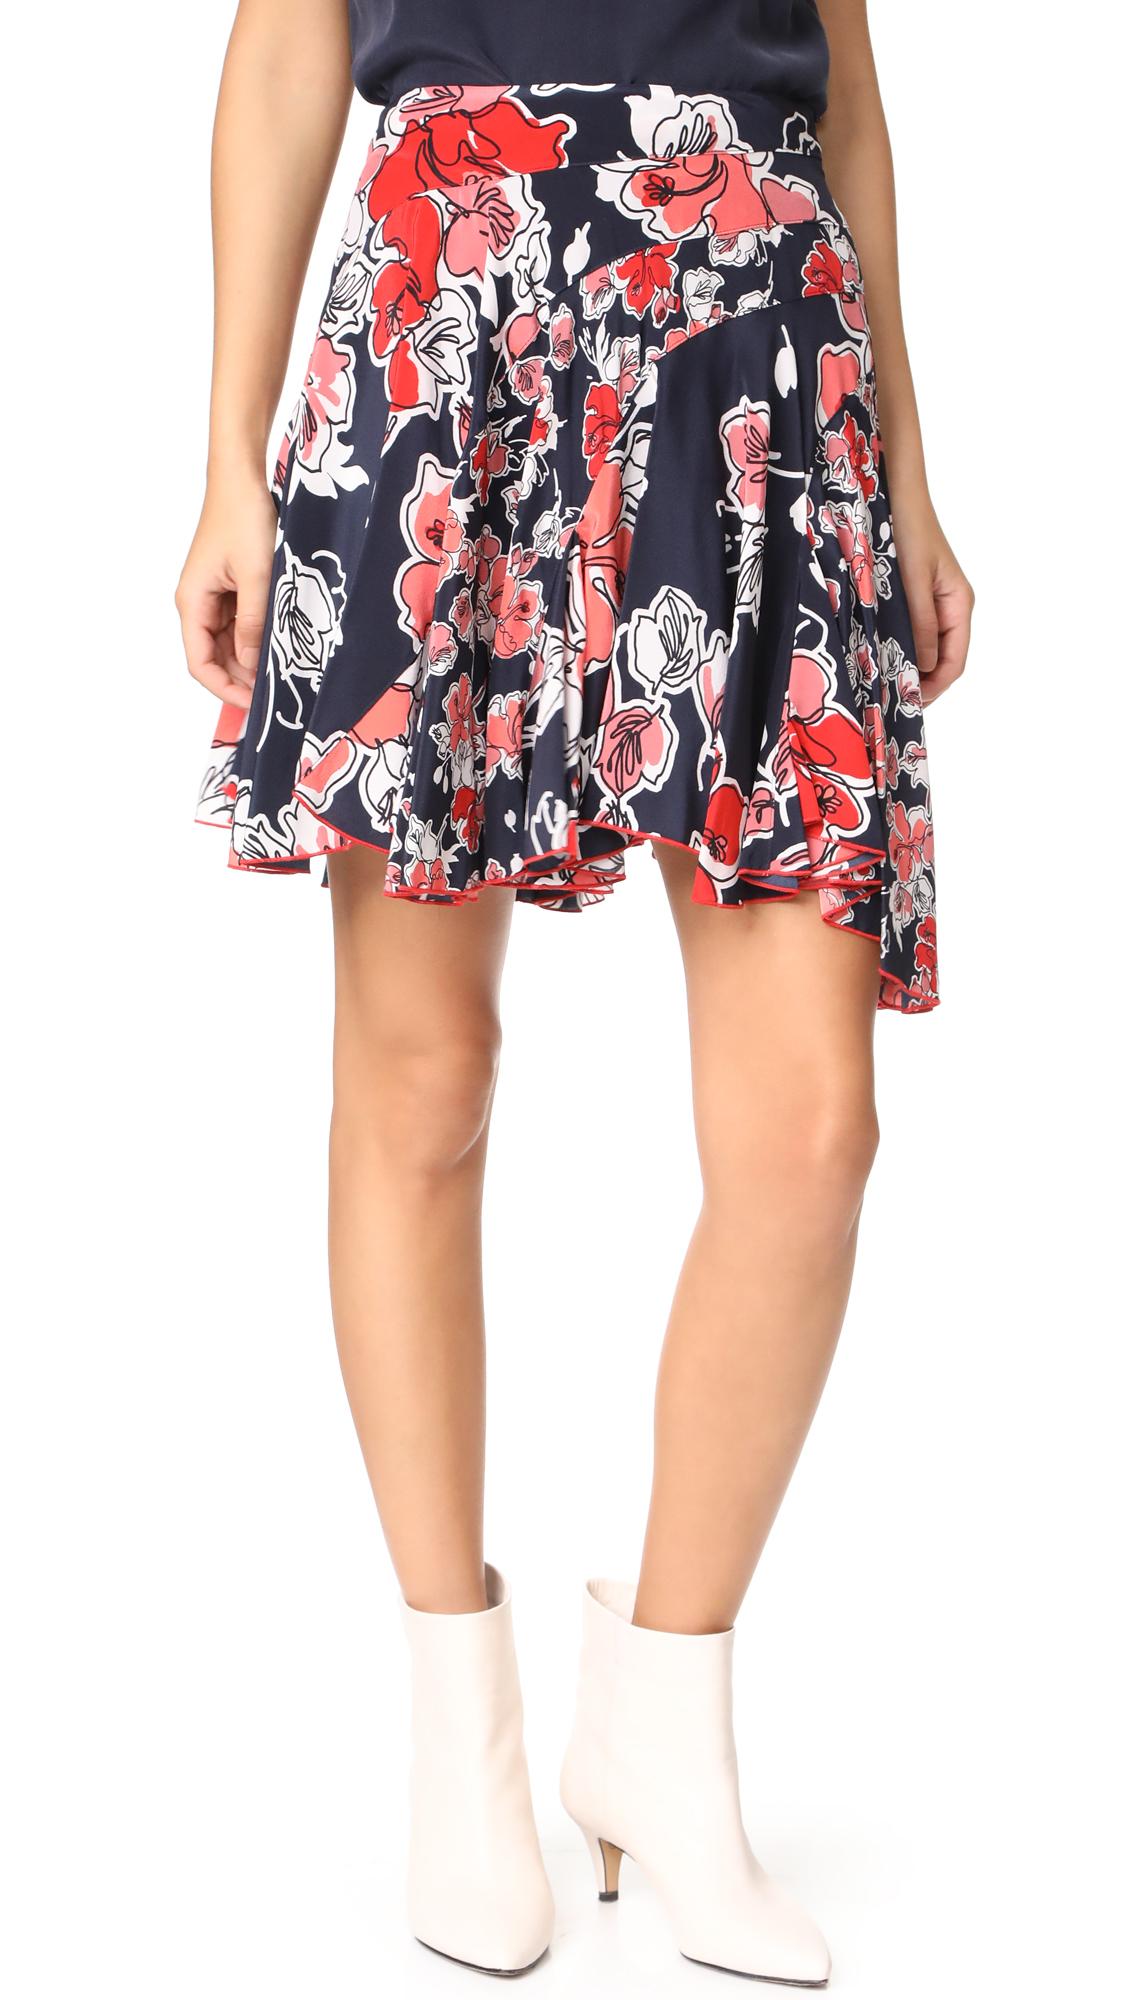 Jason Wu Grey Asymmetrical Tropical Print Skirt - Midnight Multi